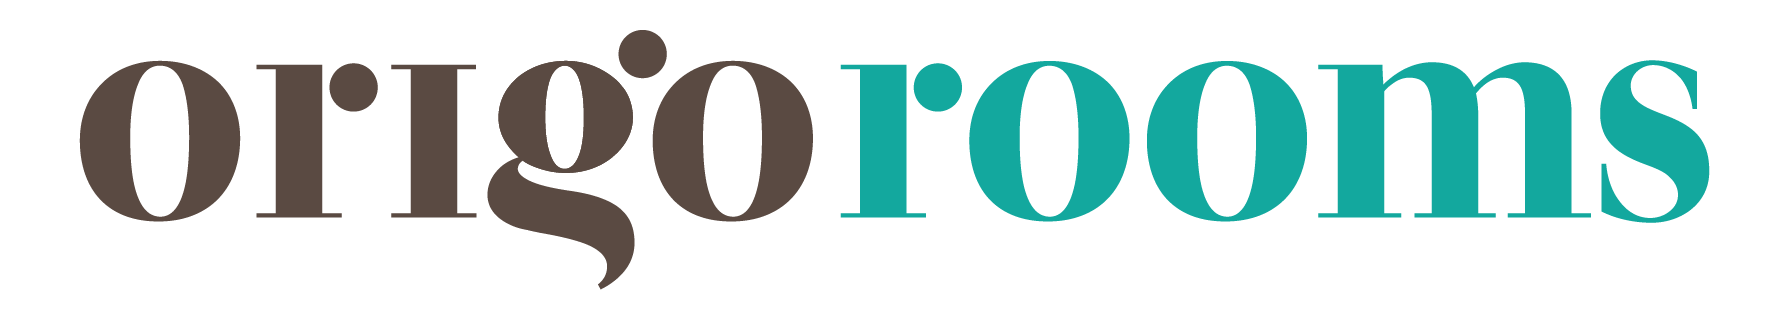 Logotipo Origorooms